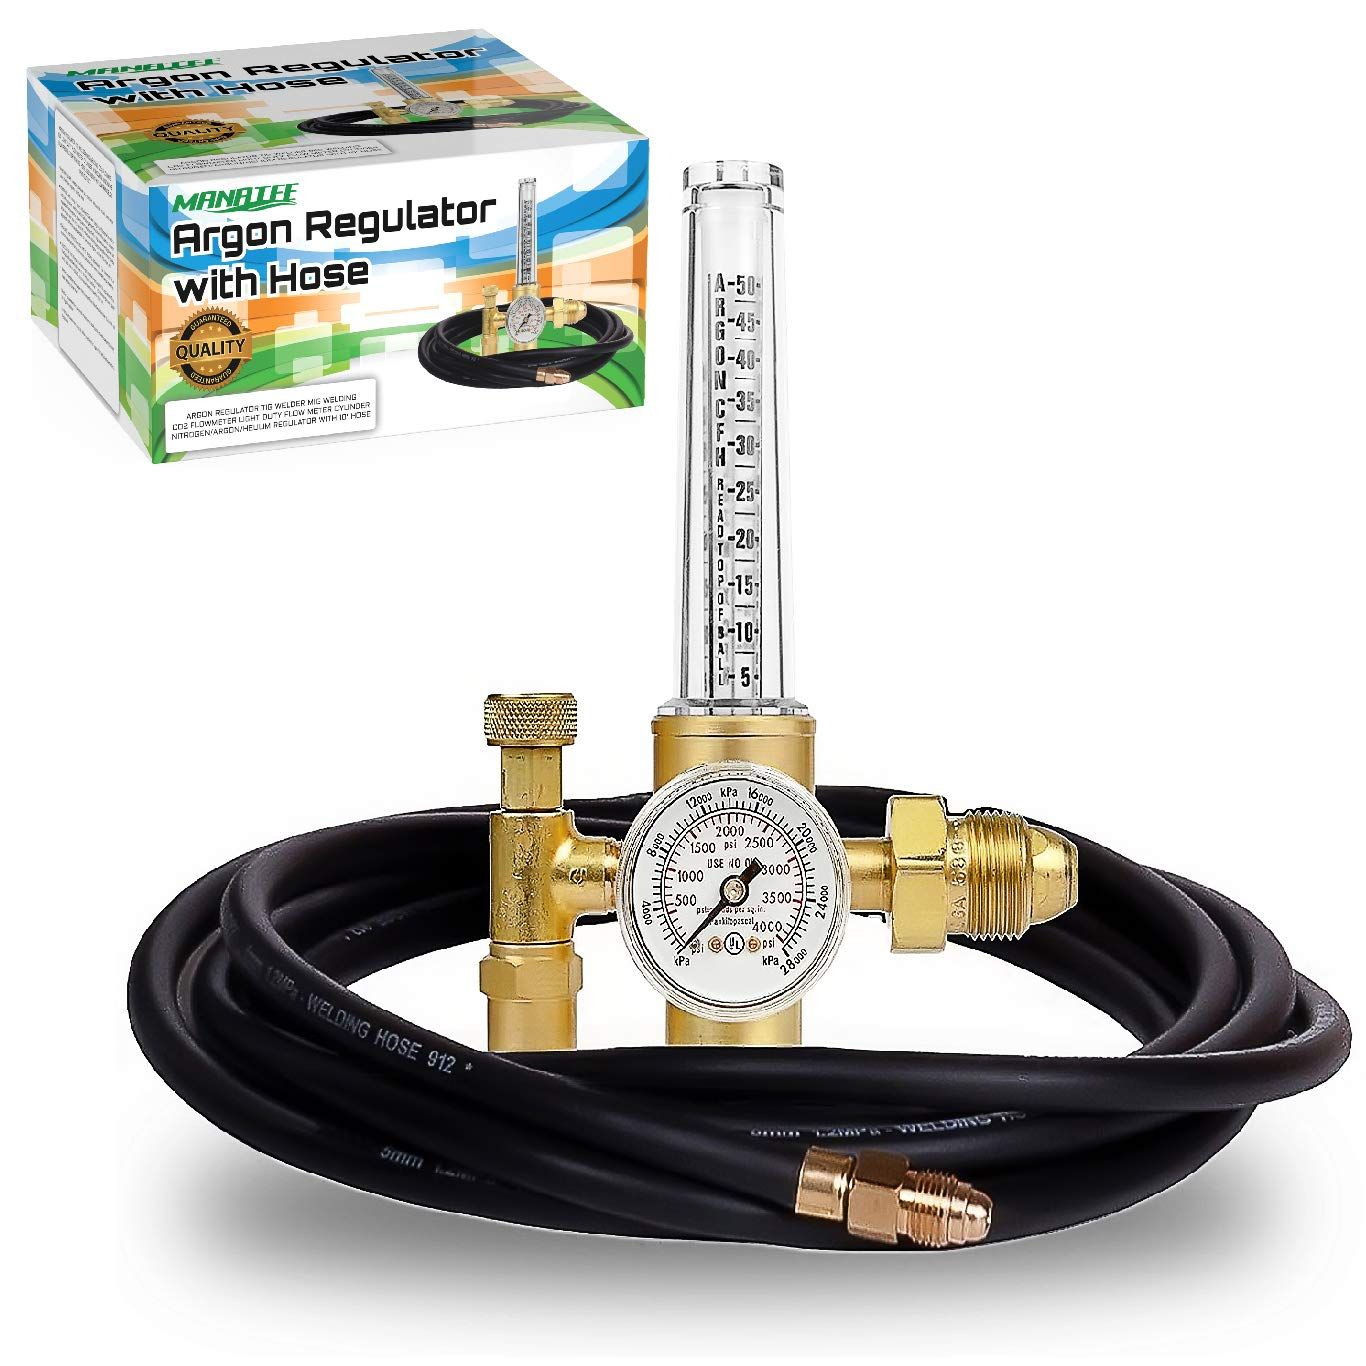 0 to 4000 psi pressure gauge CGA580 inlet Connection Gas Welder Welding Regulator More Accurate Gas Metering For Gas Delivery System Argon Regulator TIG Welder MIG Welding CO2 Flowmeter 10 to 60 CFH